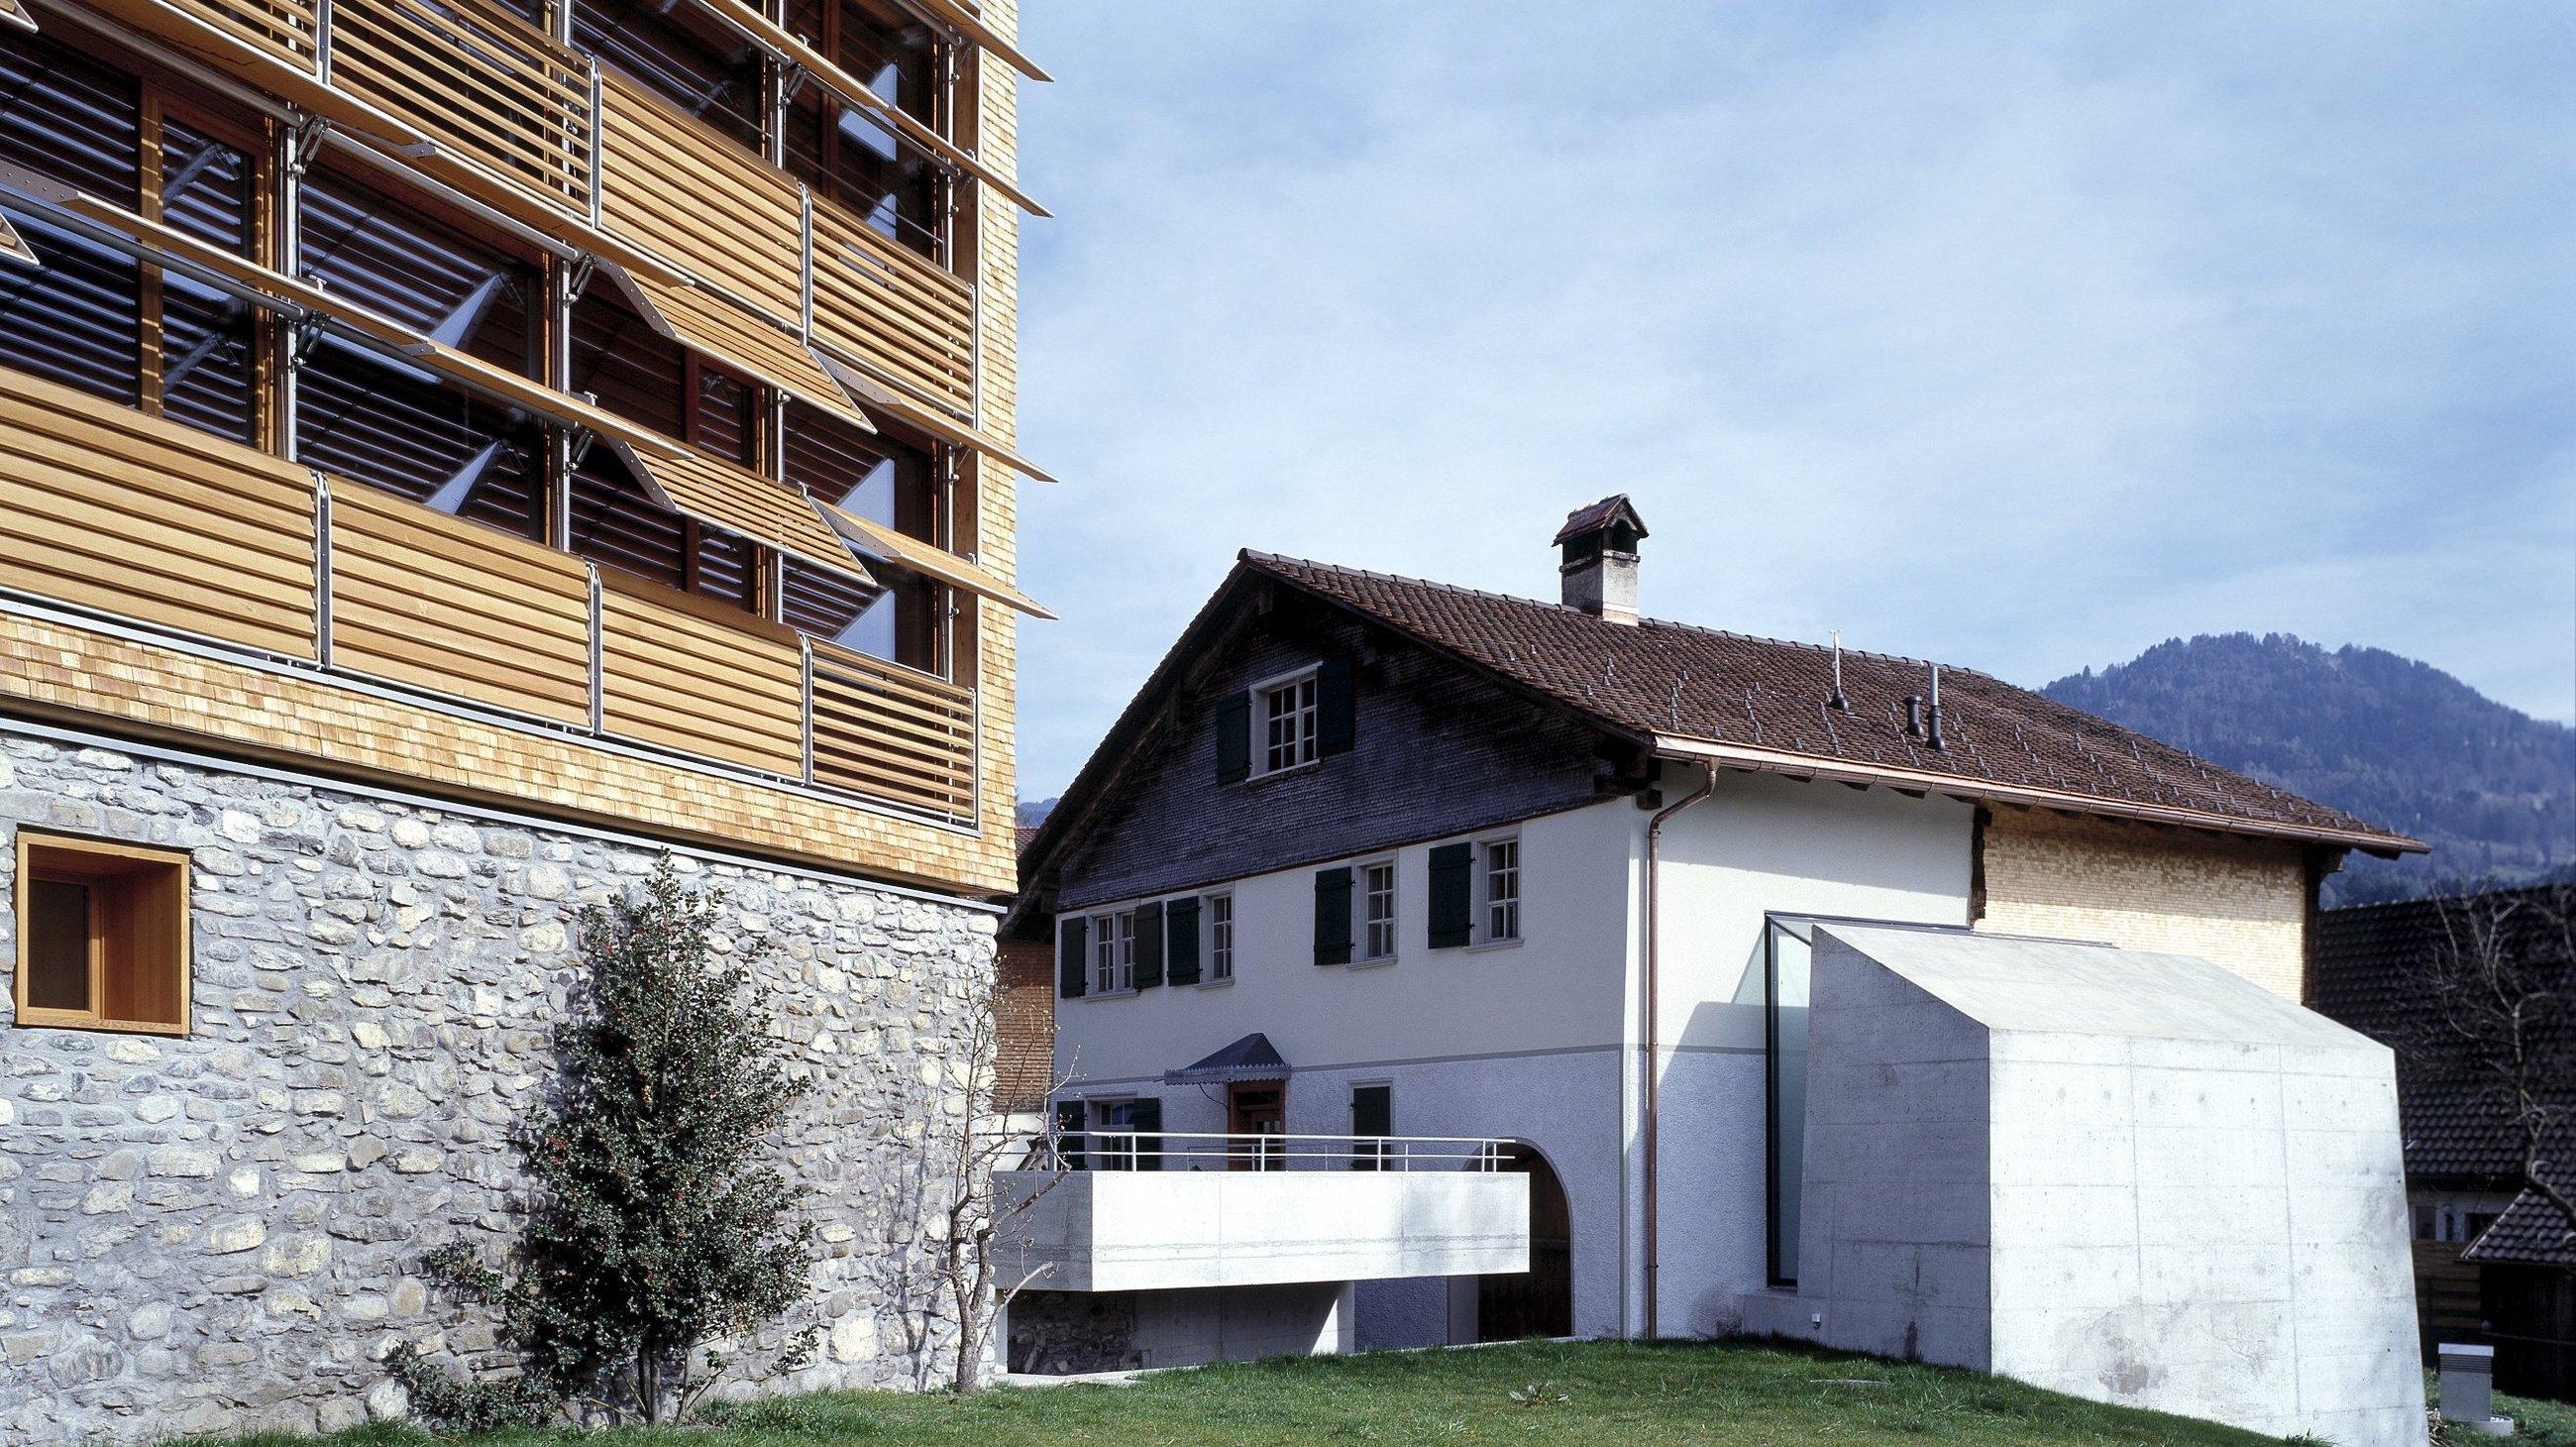 Bürohaus Frick & Vinothek Stöger, Röthis, drexel architekten